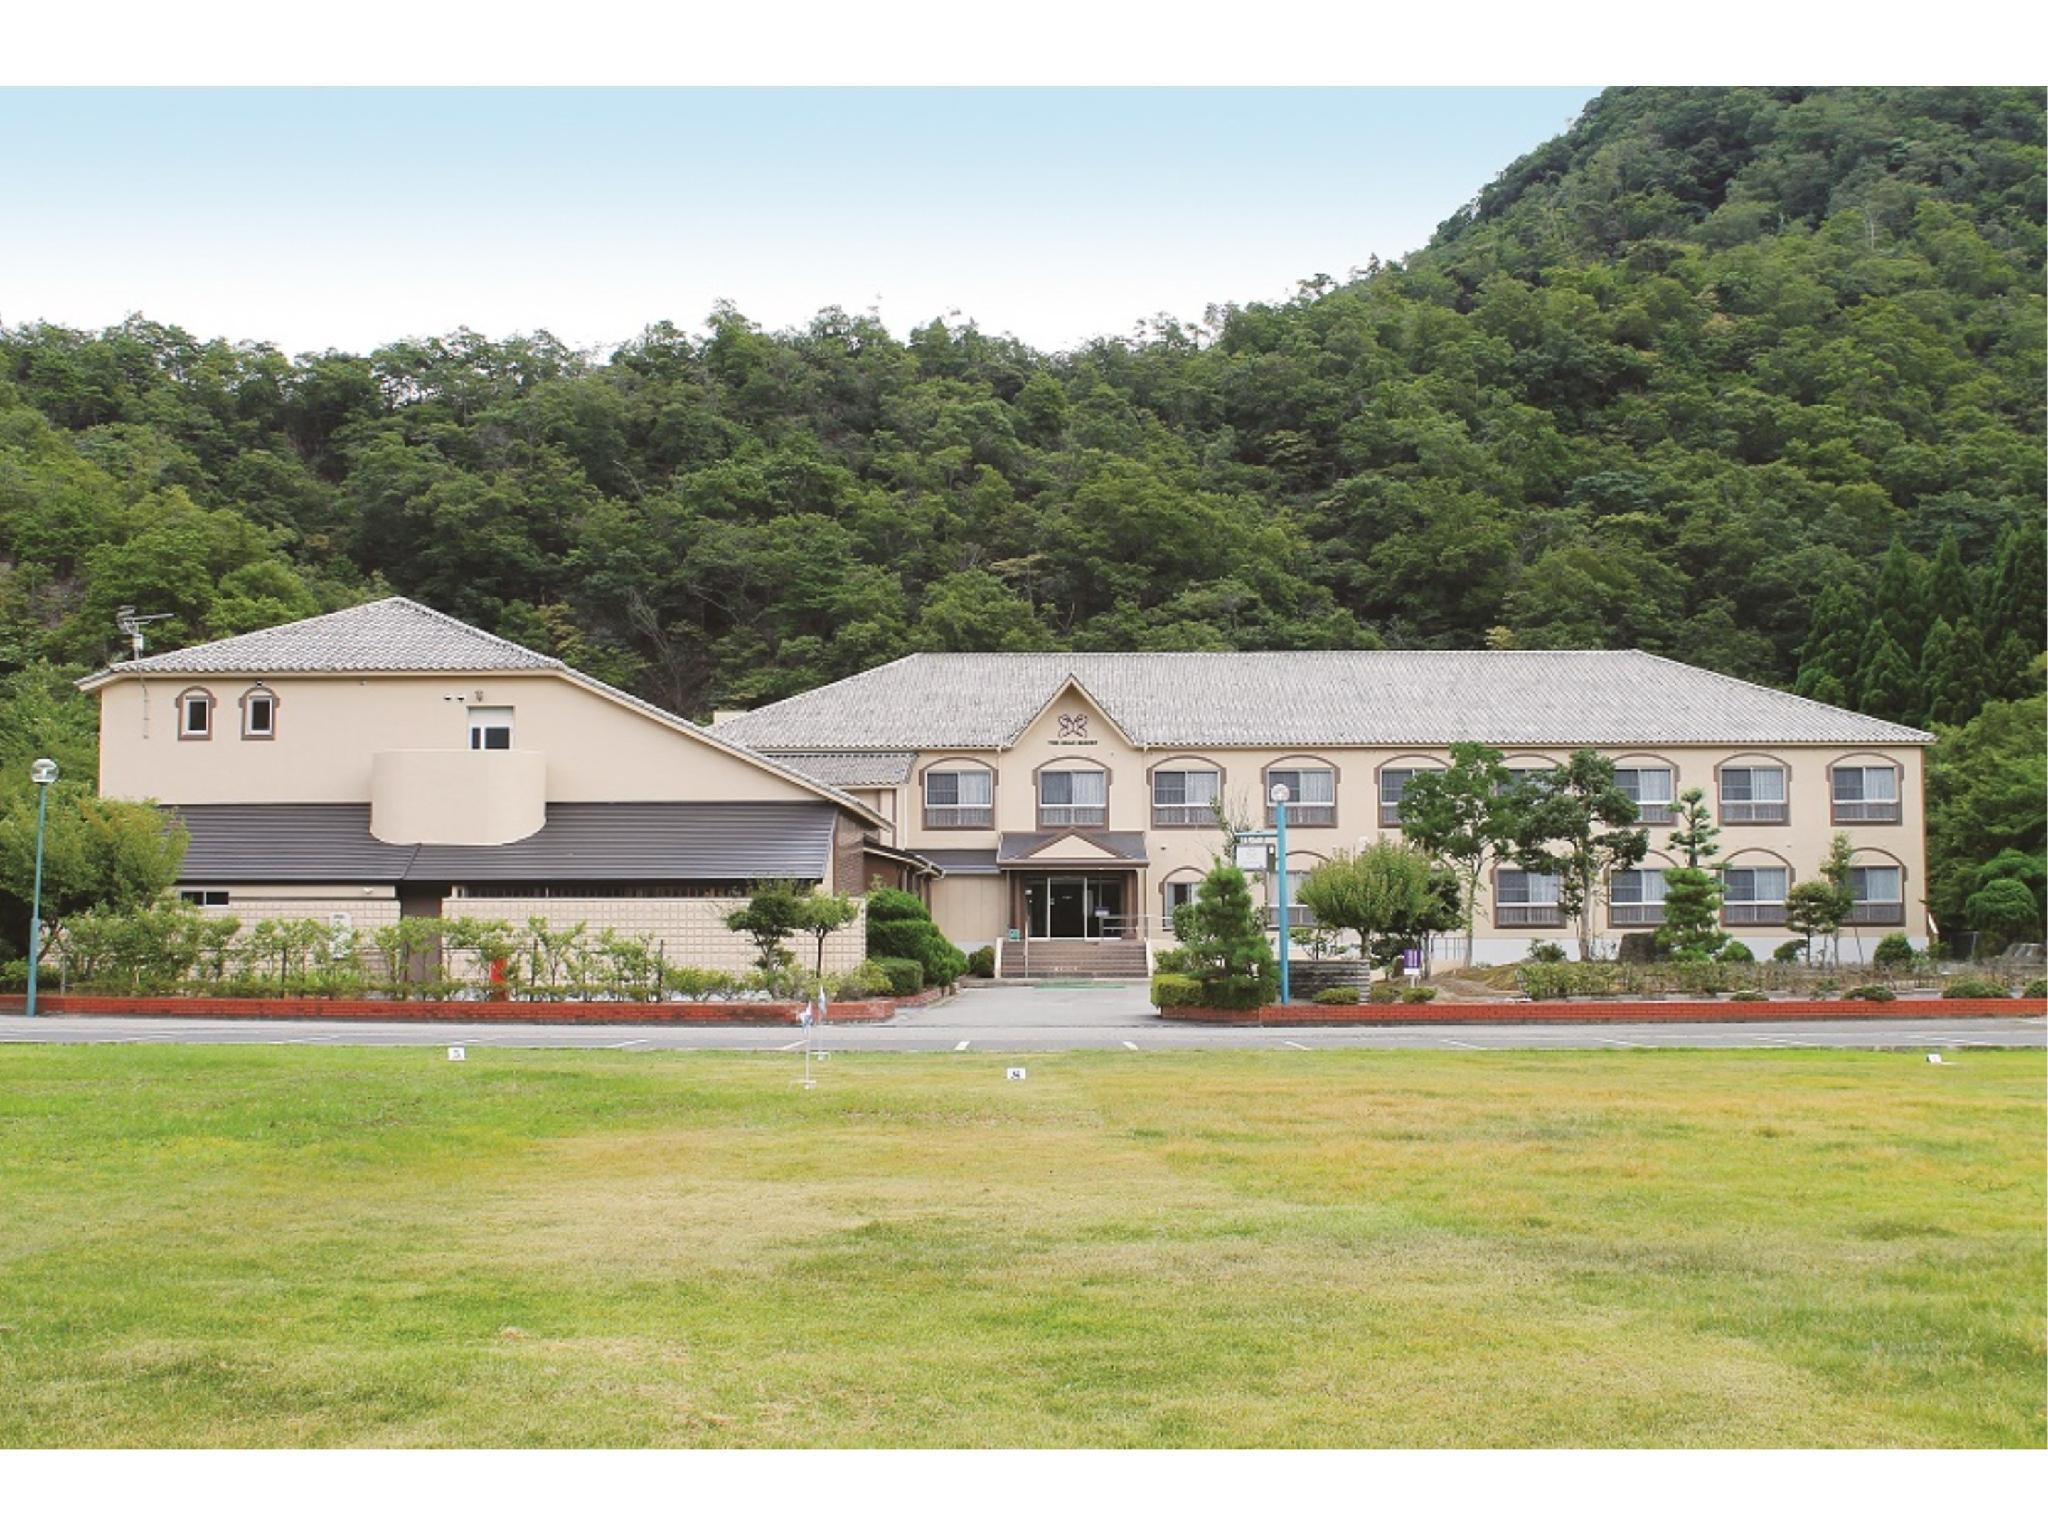 The Gran Resort Kinosaki